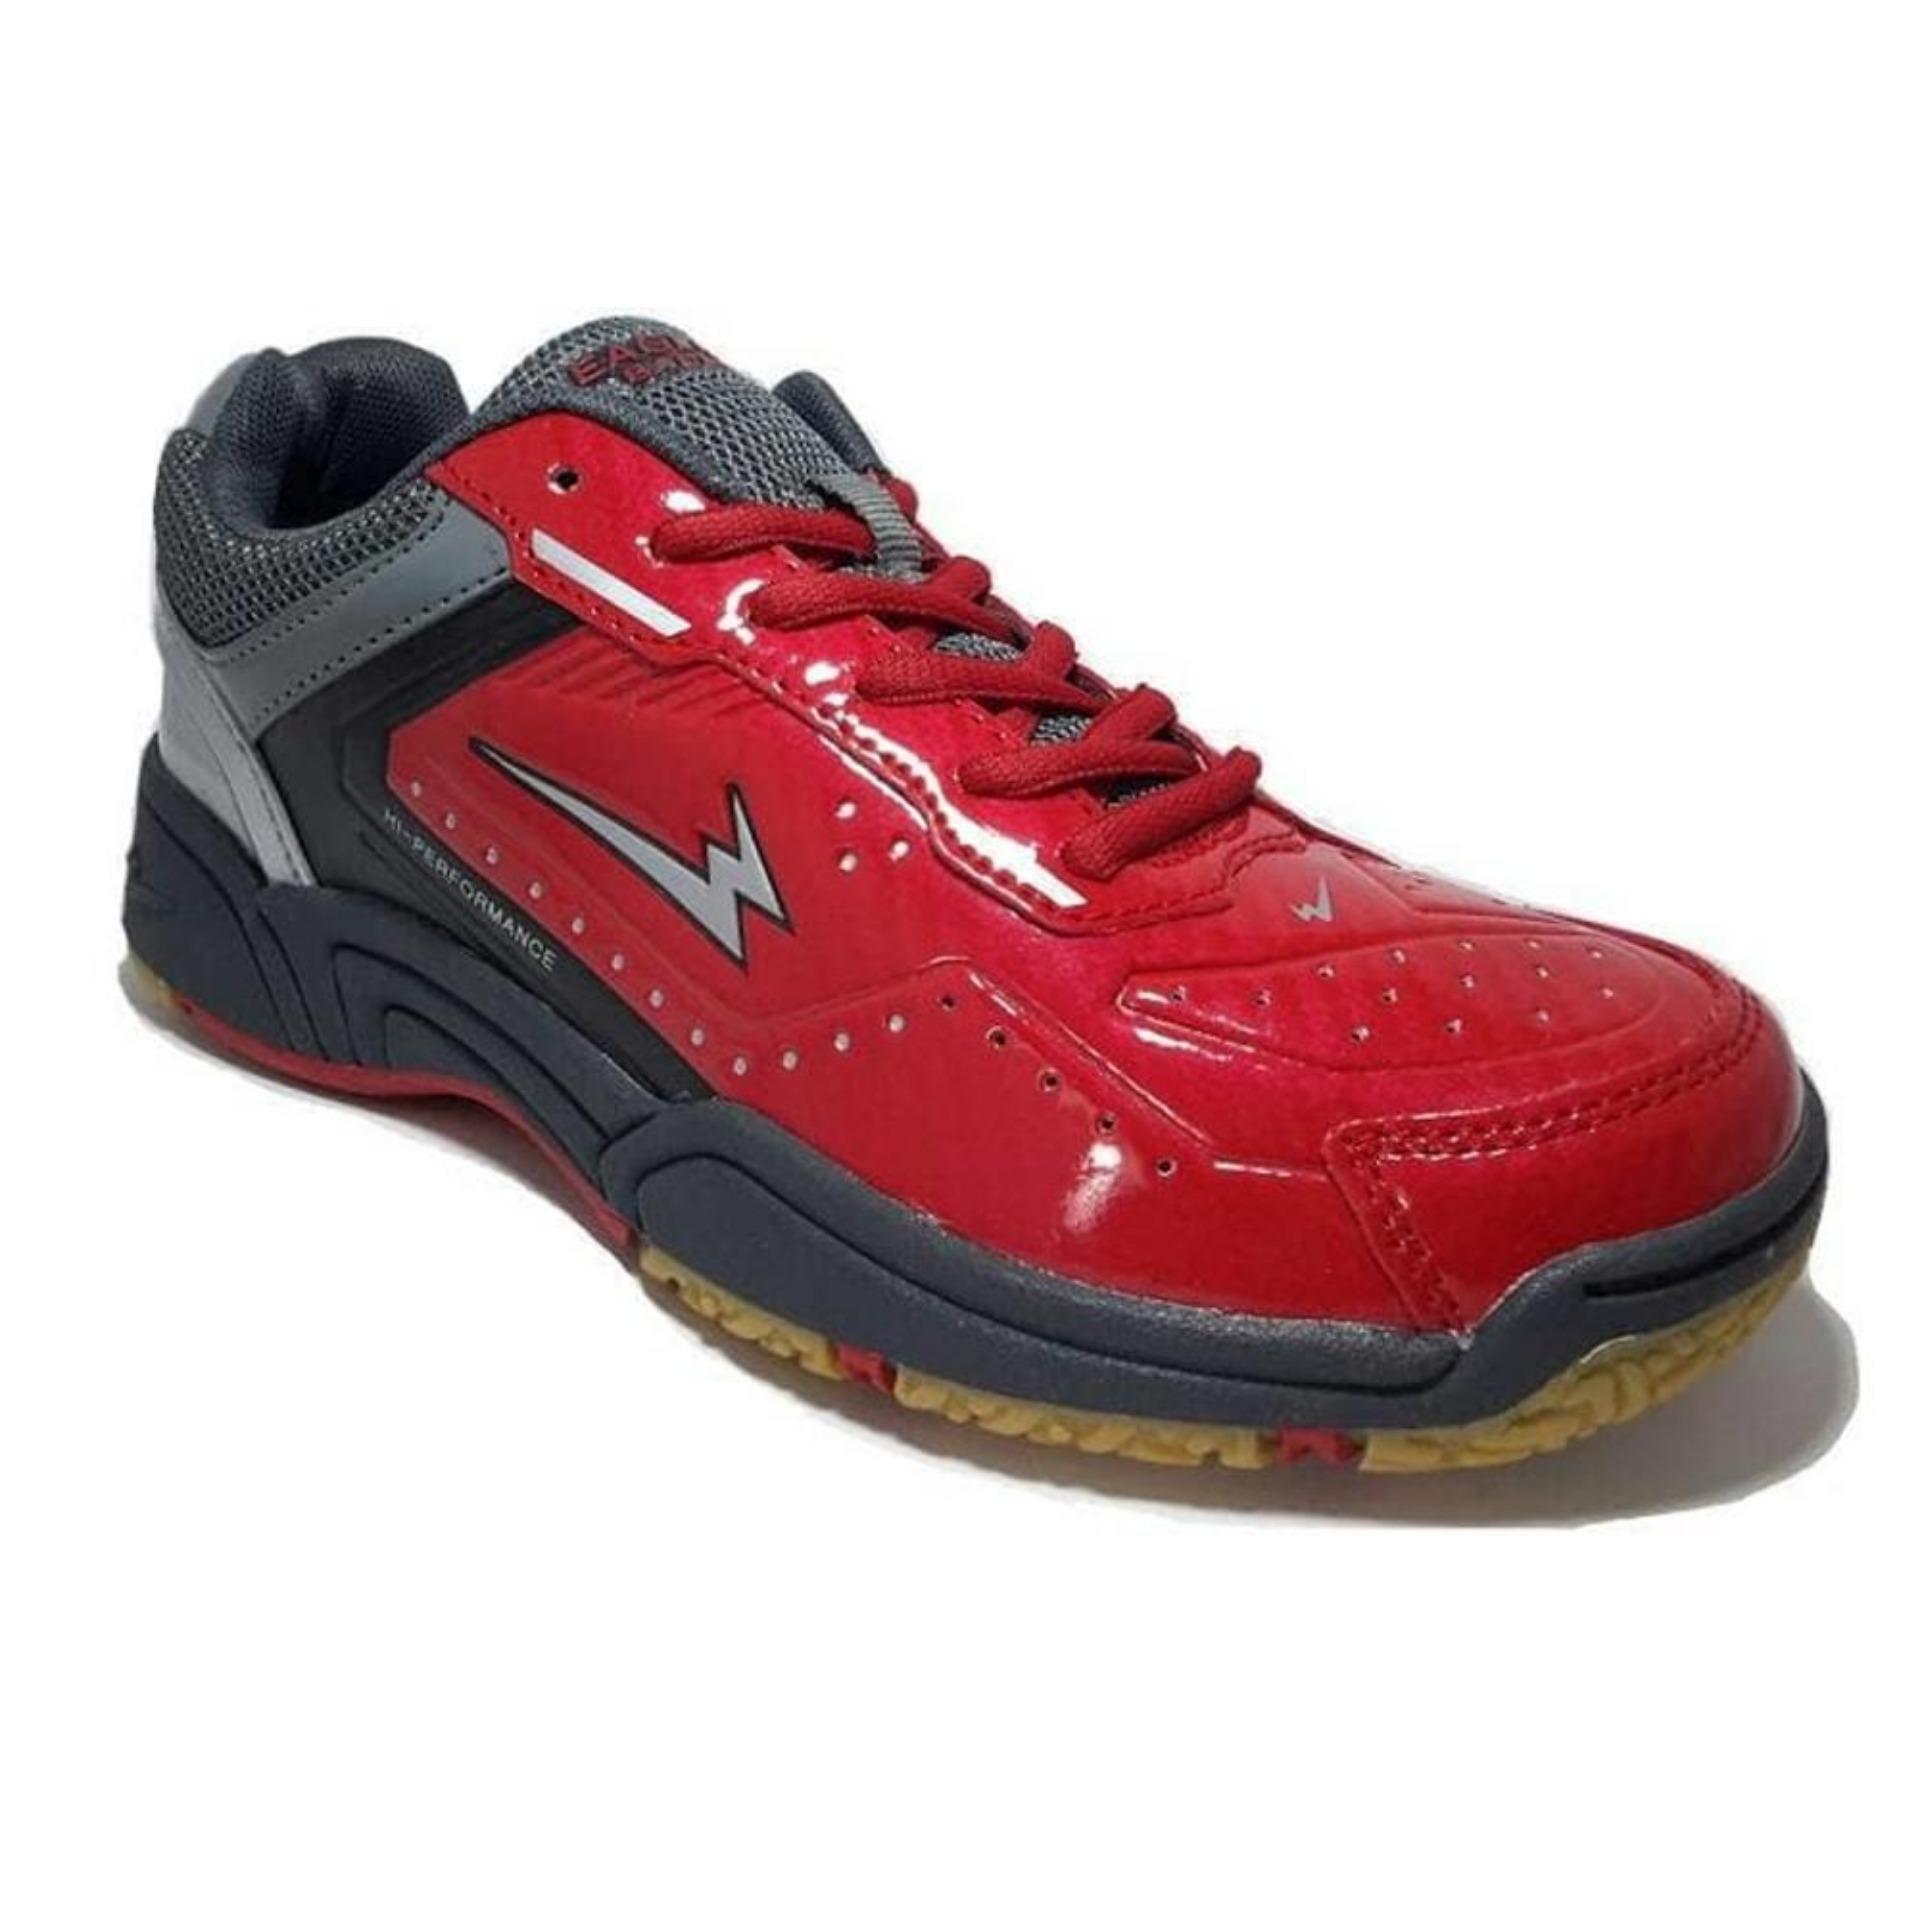 Sepatu badminton eagle premiere sepatu olahraga badminton eagle pria sepatu pria eagle sepatu eagle premier